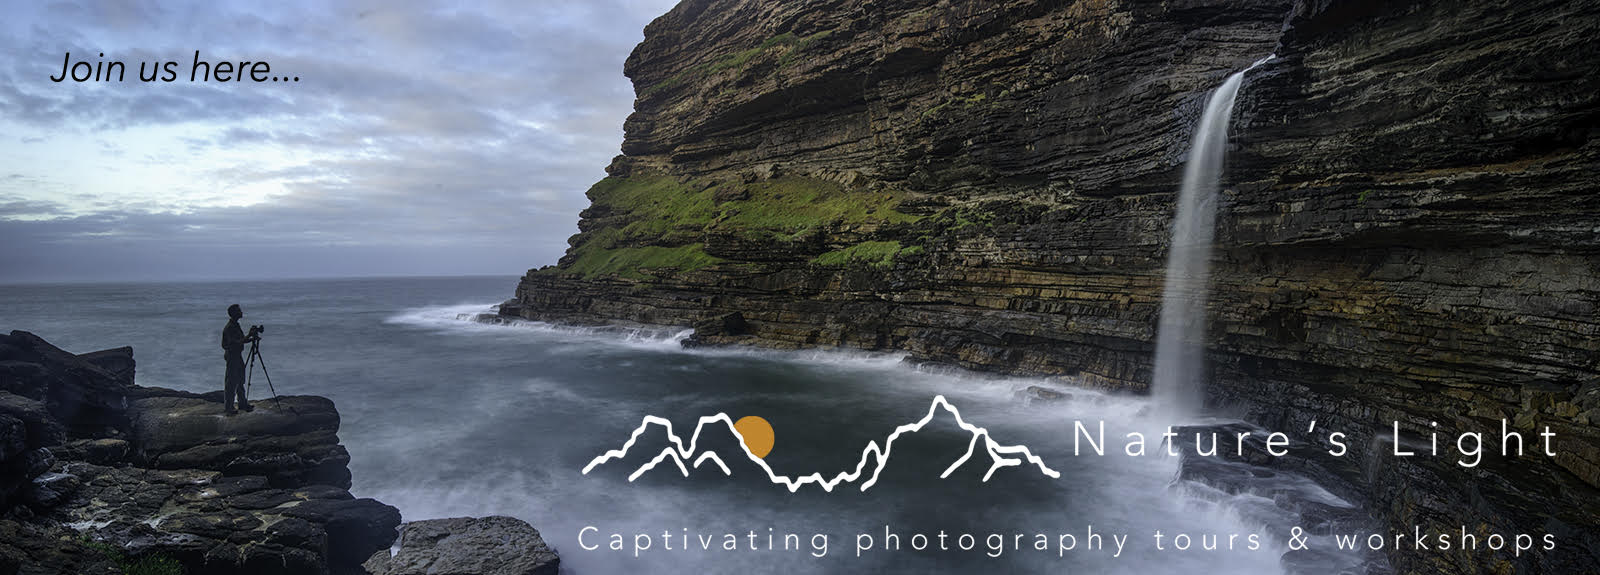 natures-light-wild-coast